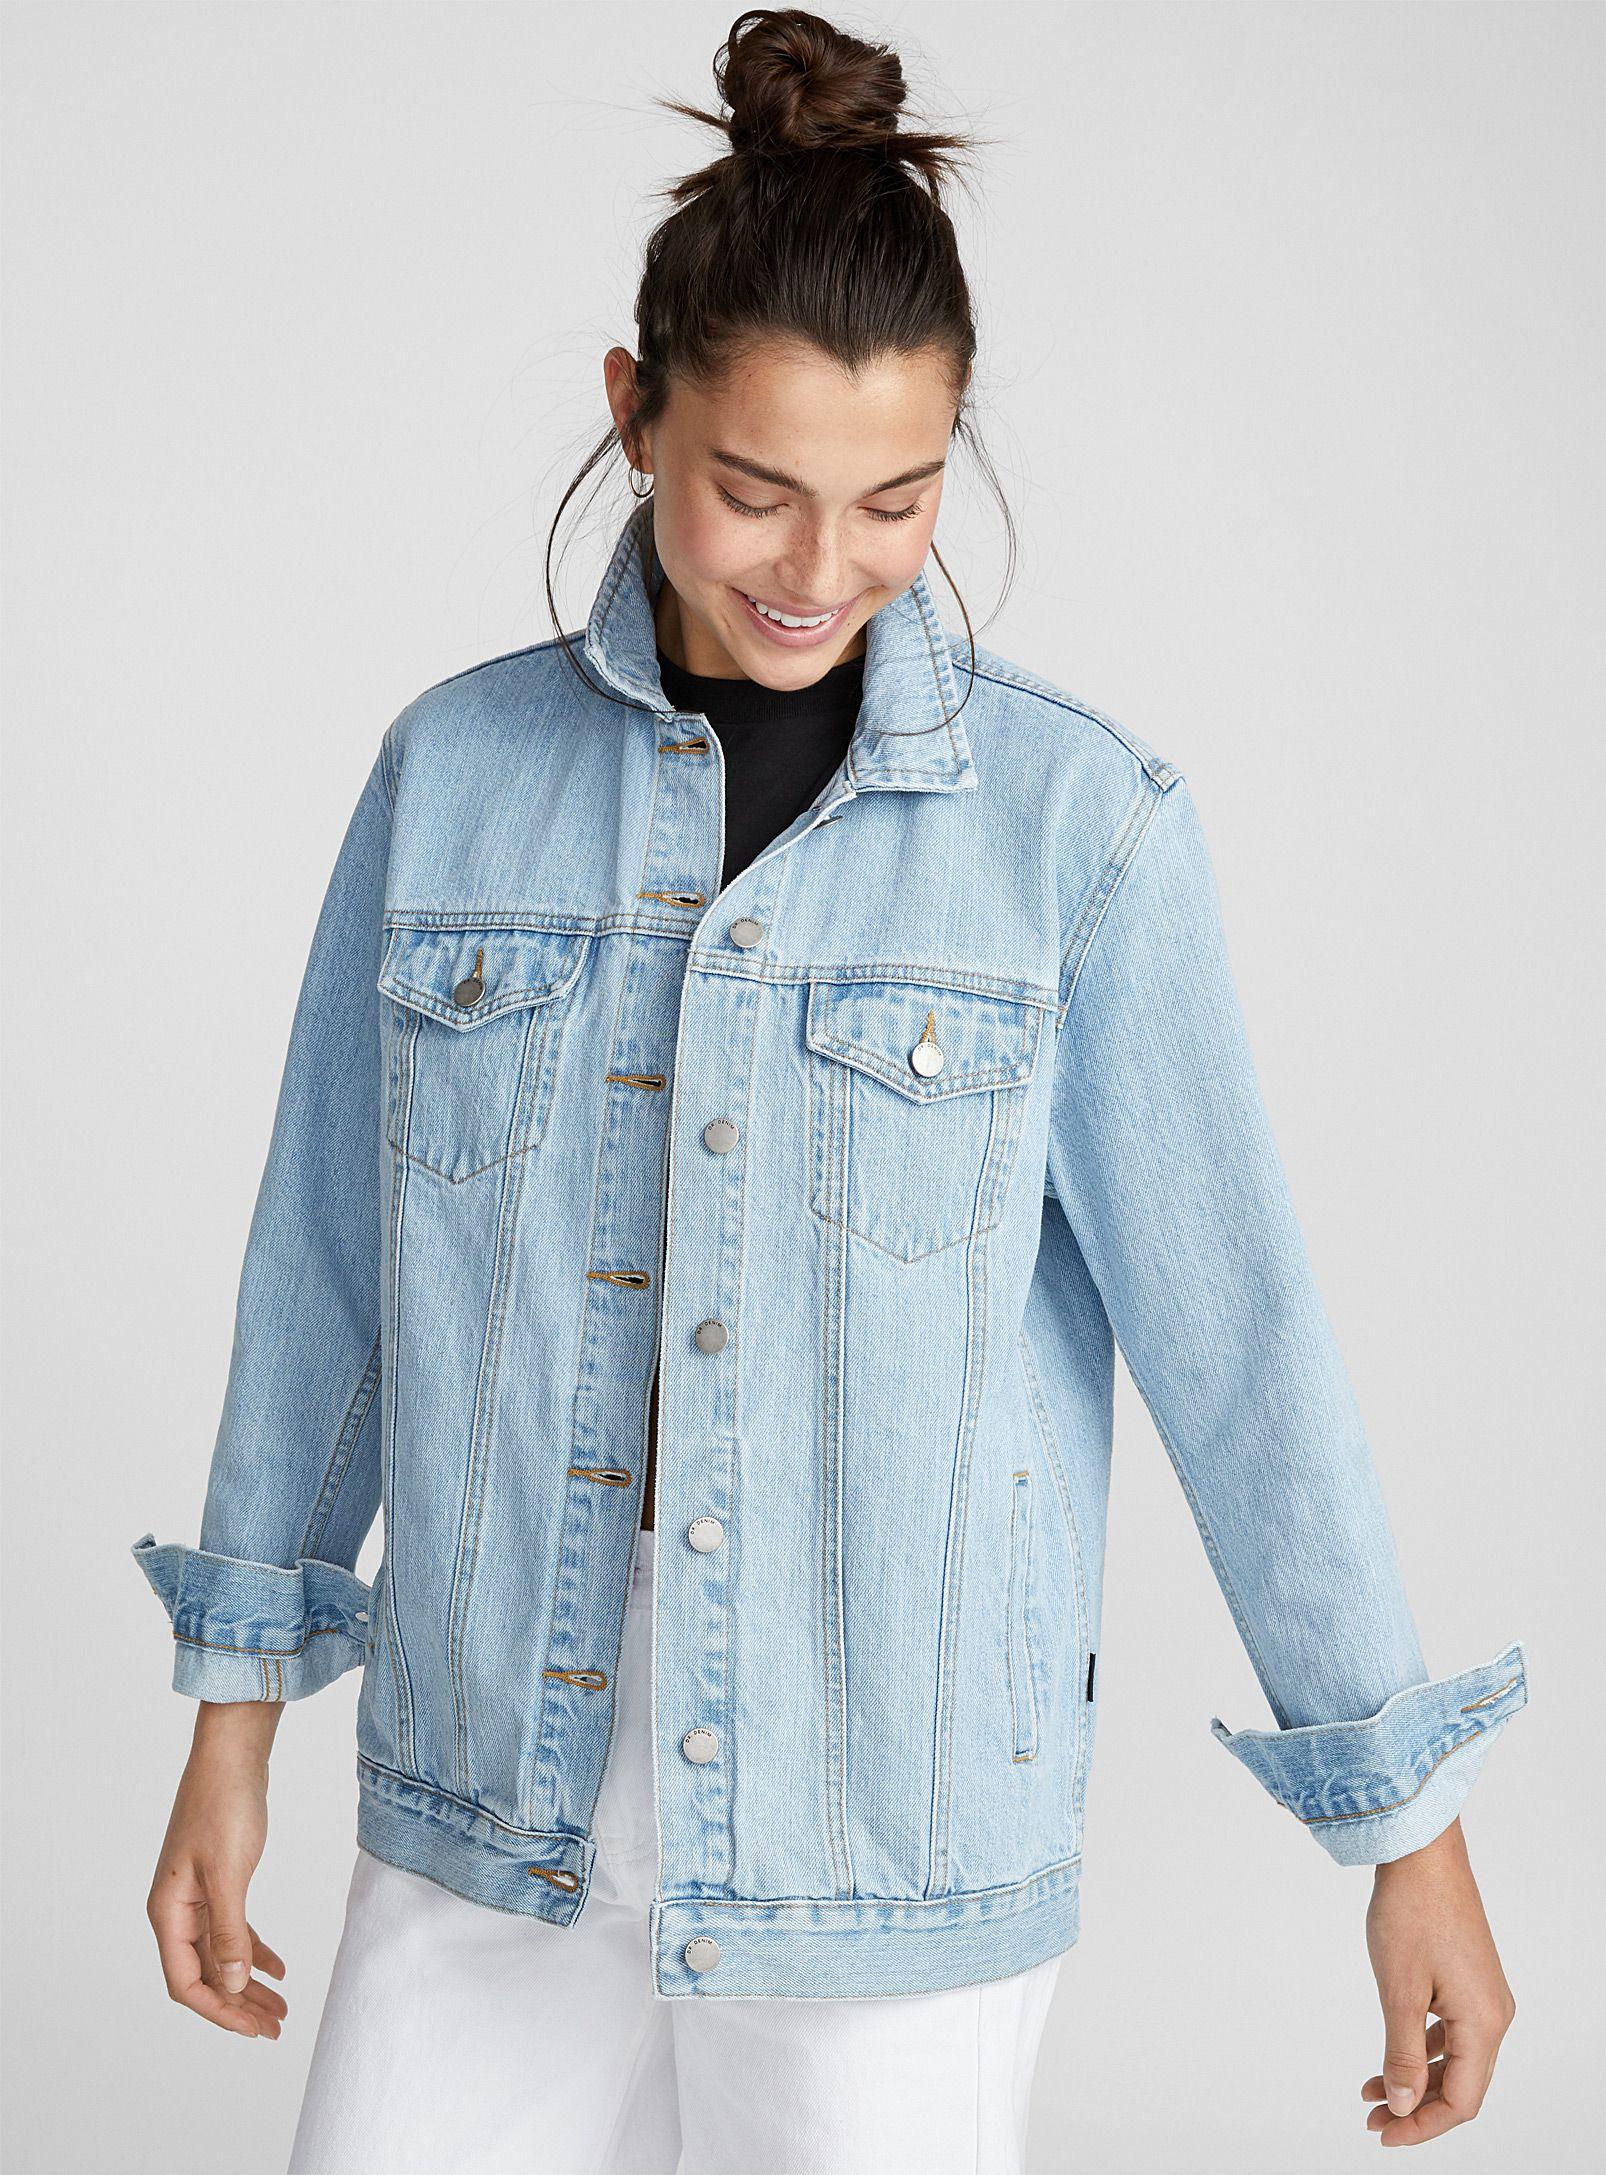 Dr Denim River Boyfriend Jean Jacket Light Blue Denim Shop Women S Denim Jackets Online Simons Deni Denim Jacket Women Denim Jacket Light Jean Jacket [ 2175 x 1606 Pixel ]